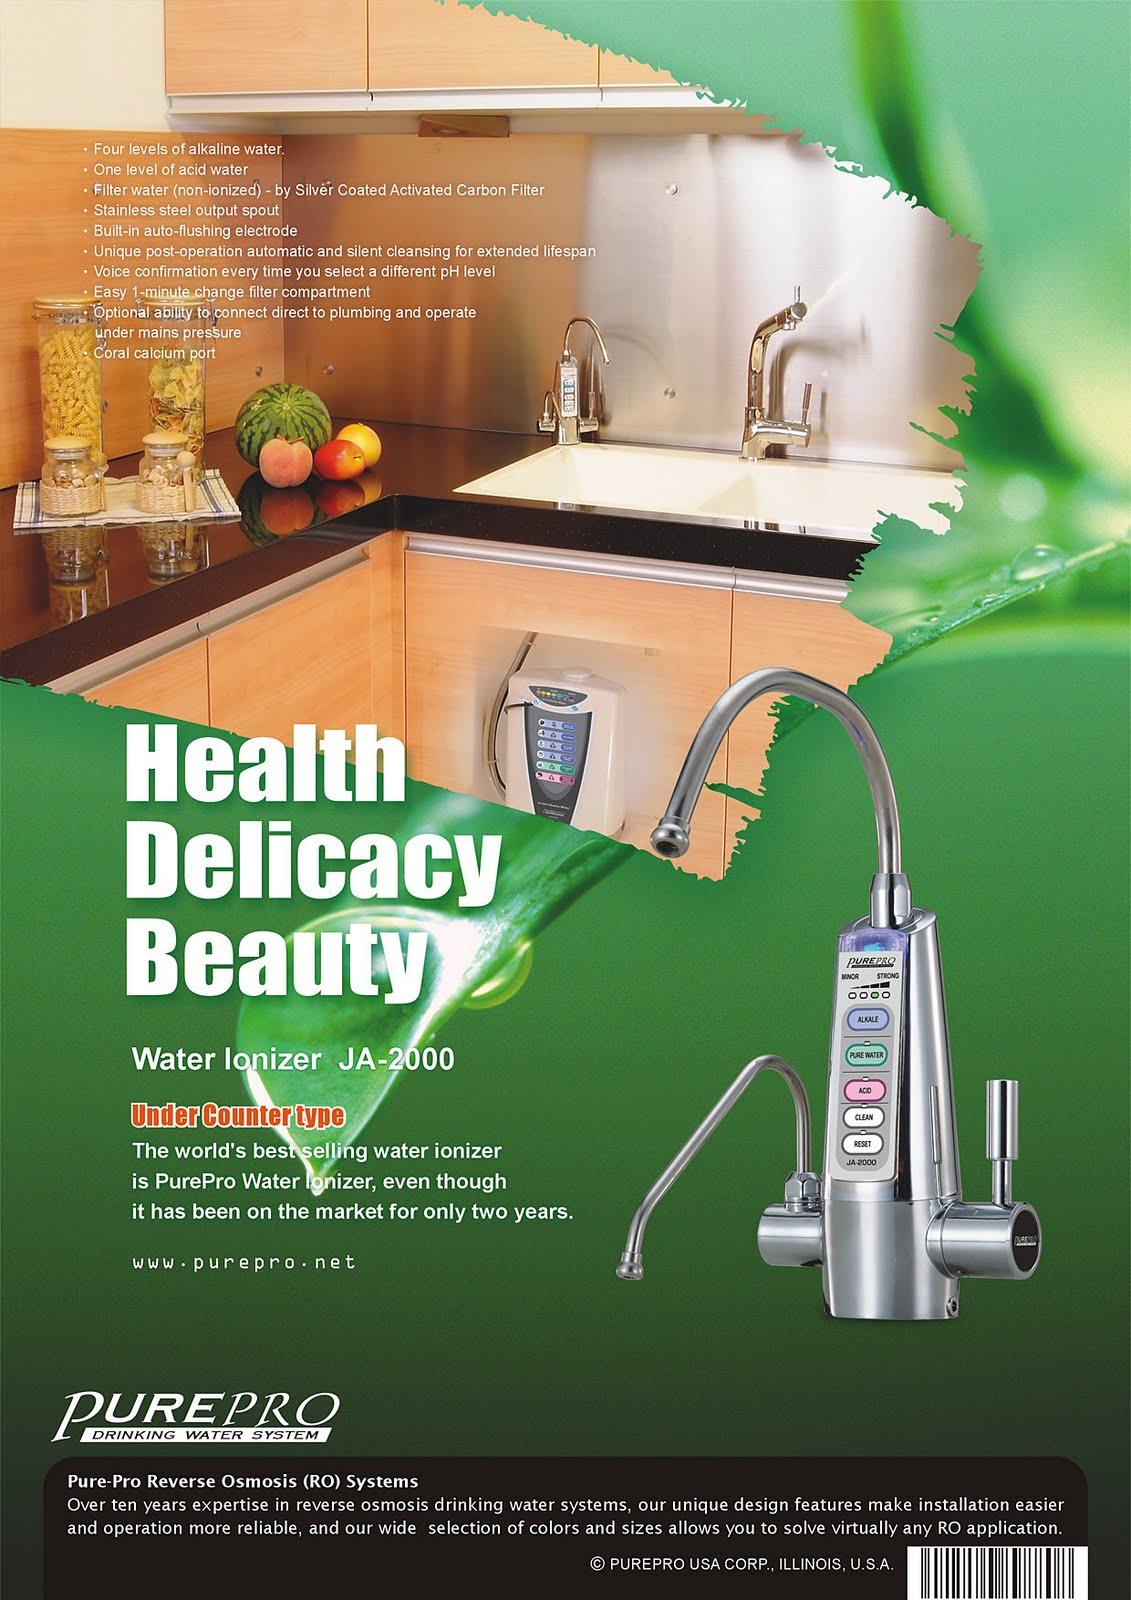 PurePro USA Water Ionizer JA-2000